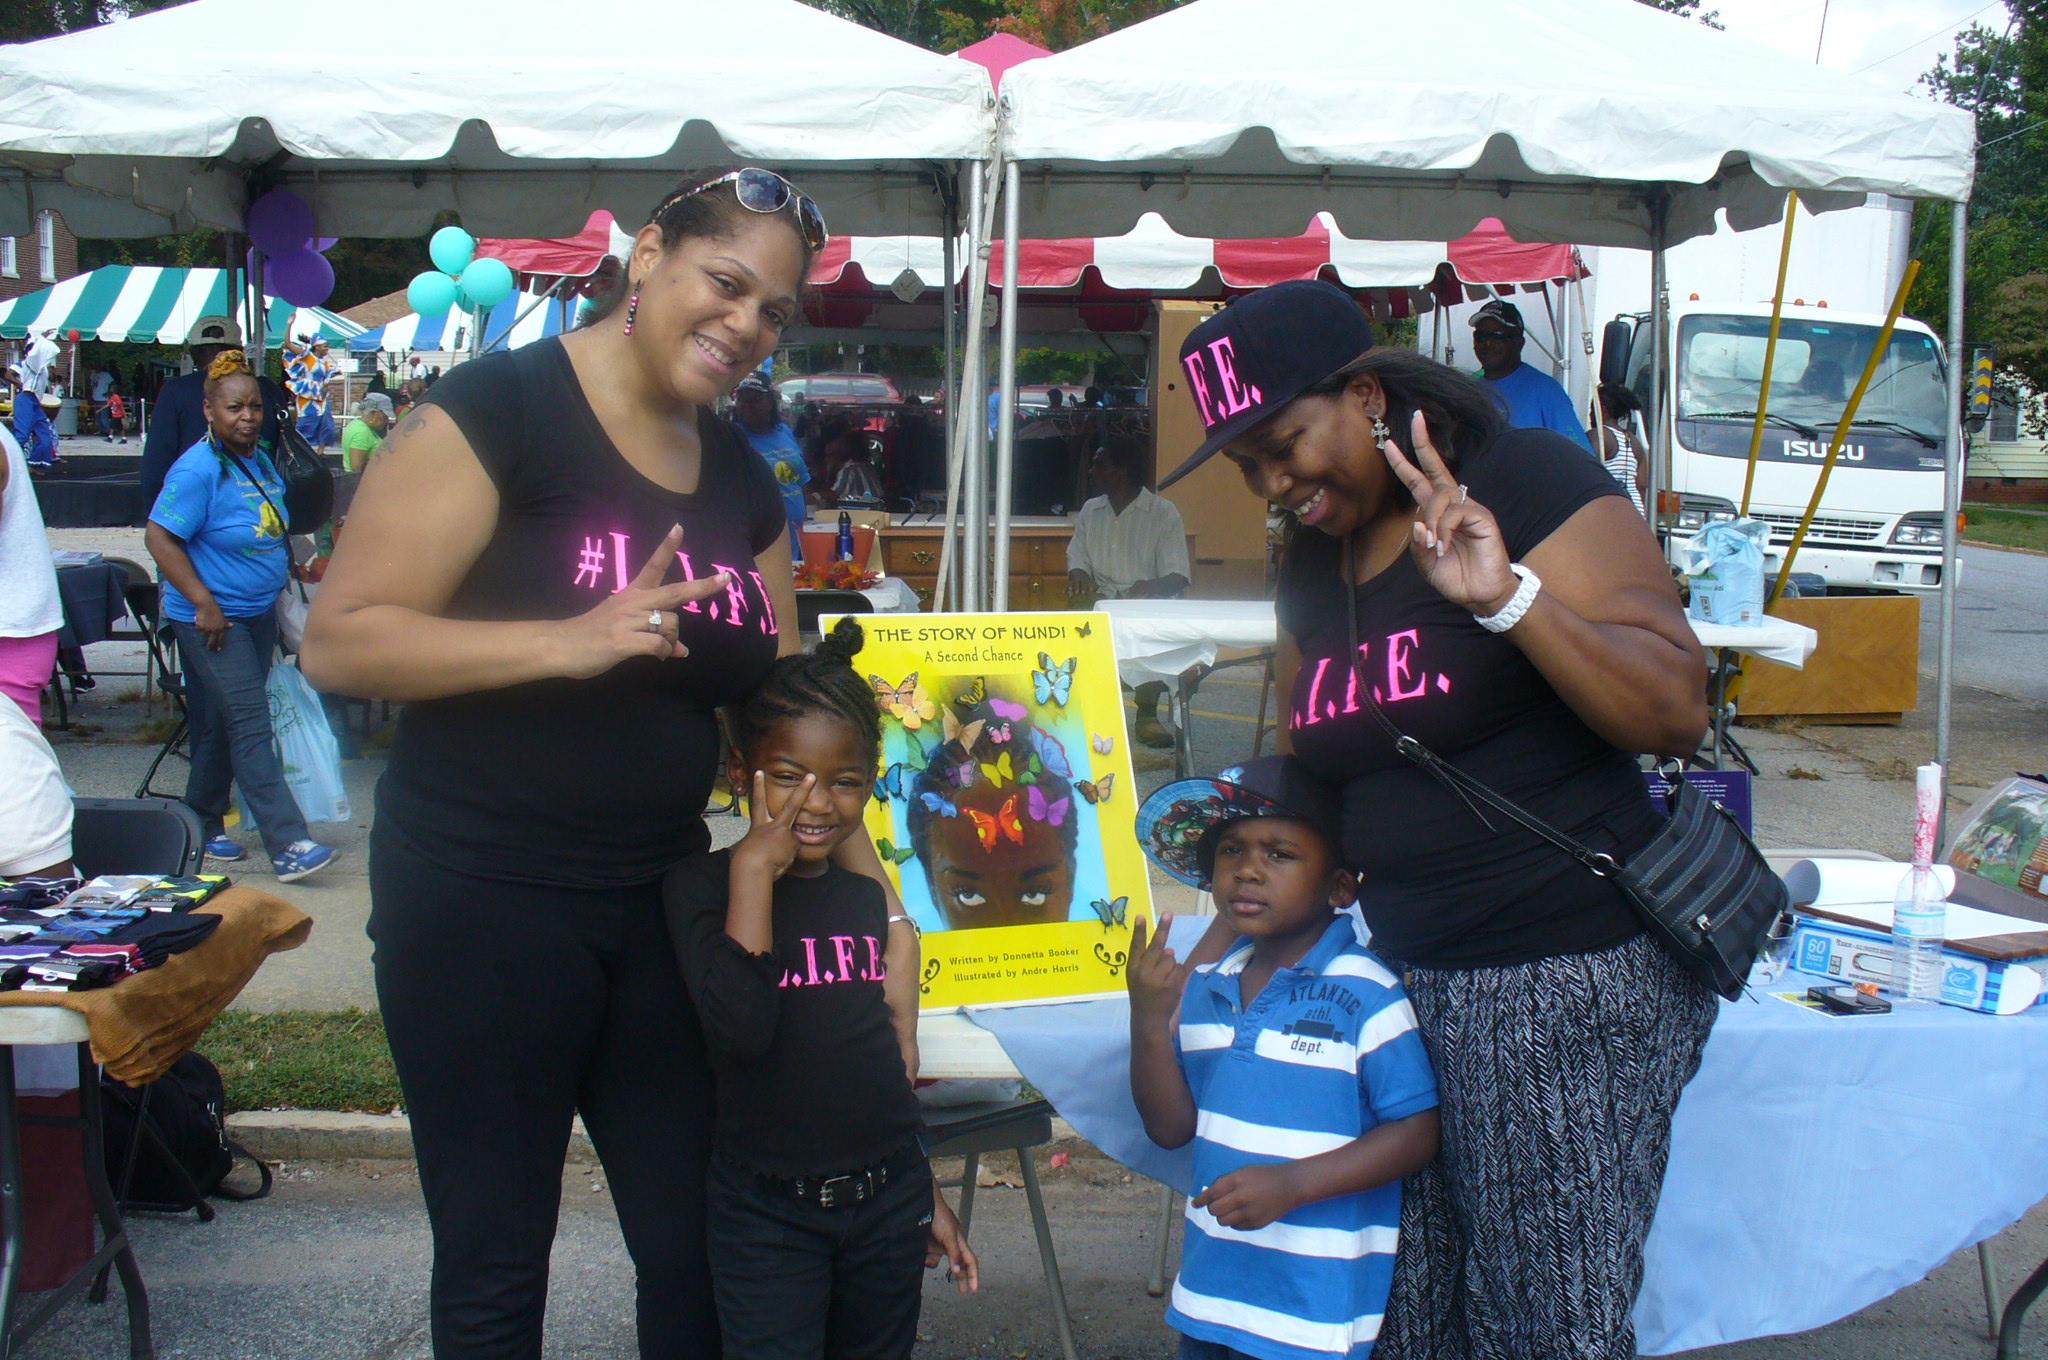 #L.I.F.E. (Ladies In Full Effect) with Nundi.